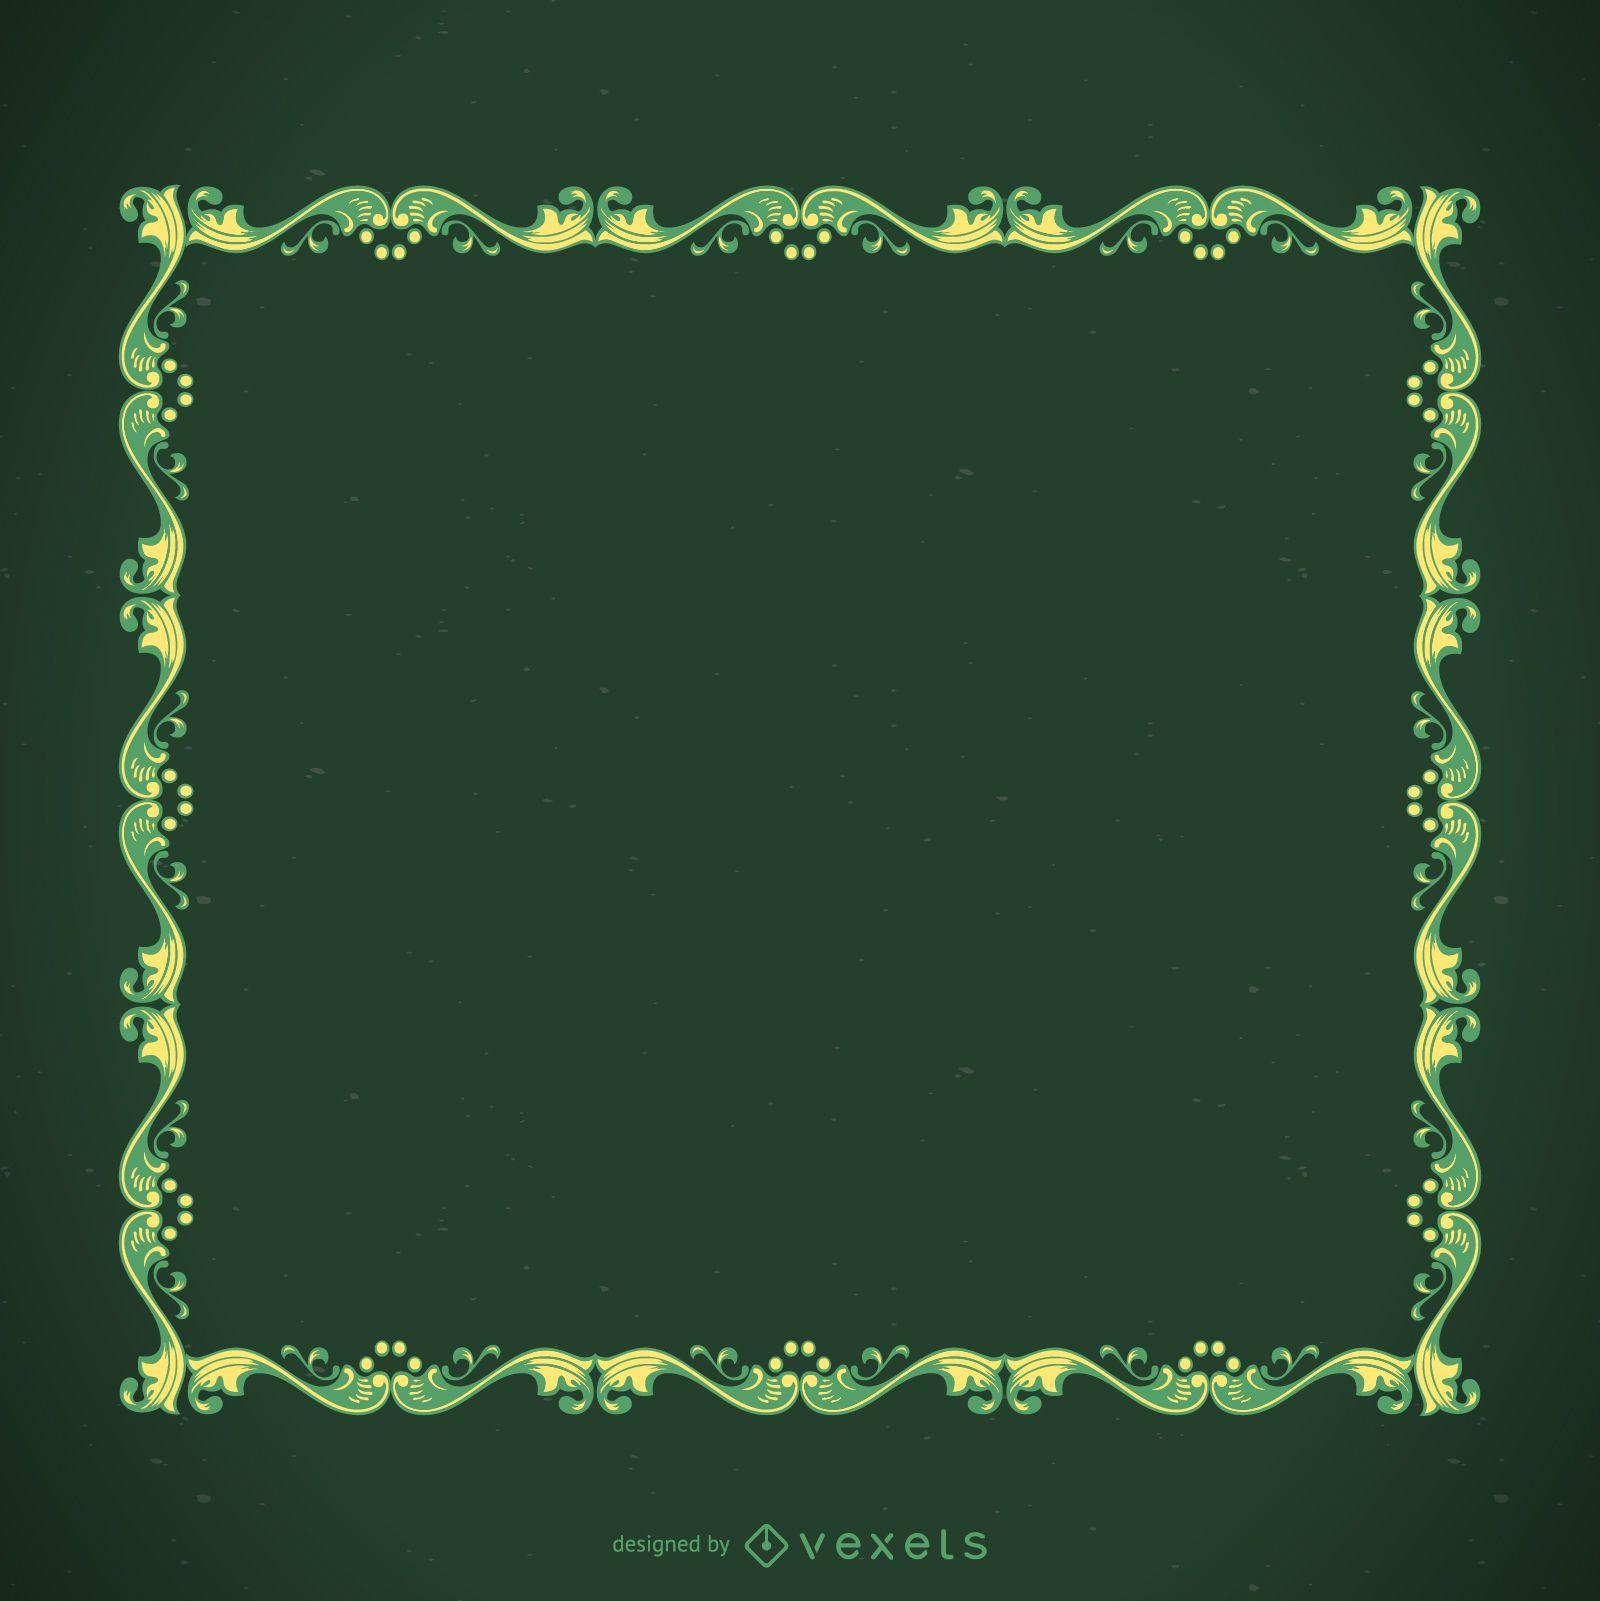 Green decorative frame